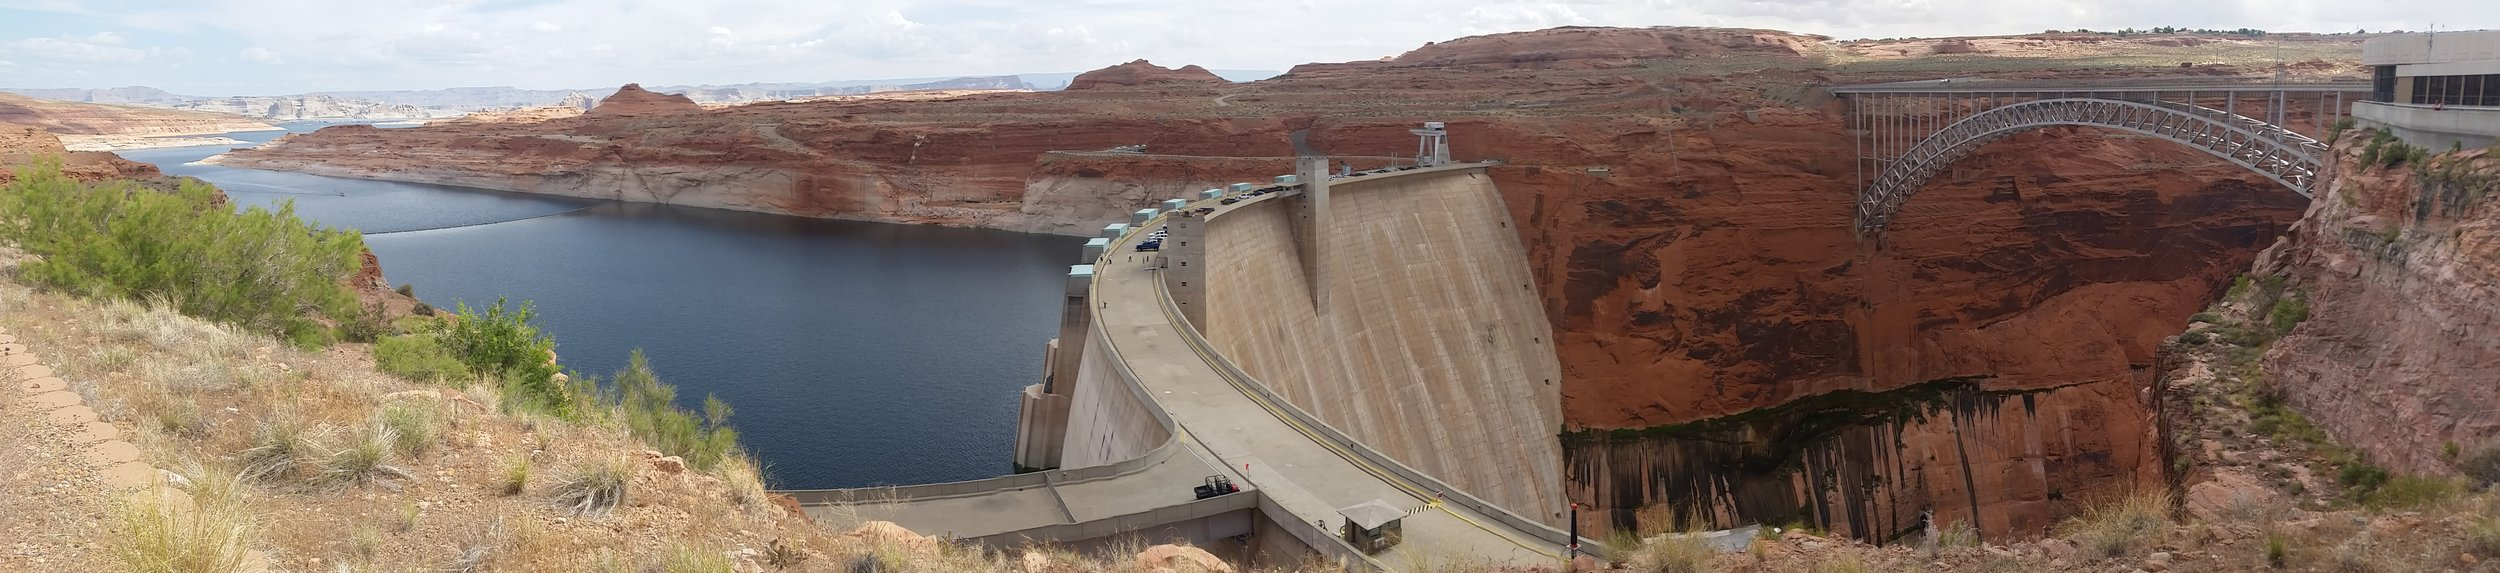 Glen Canyon and Dam on the Colorado River